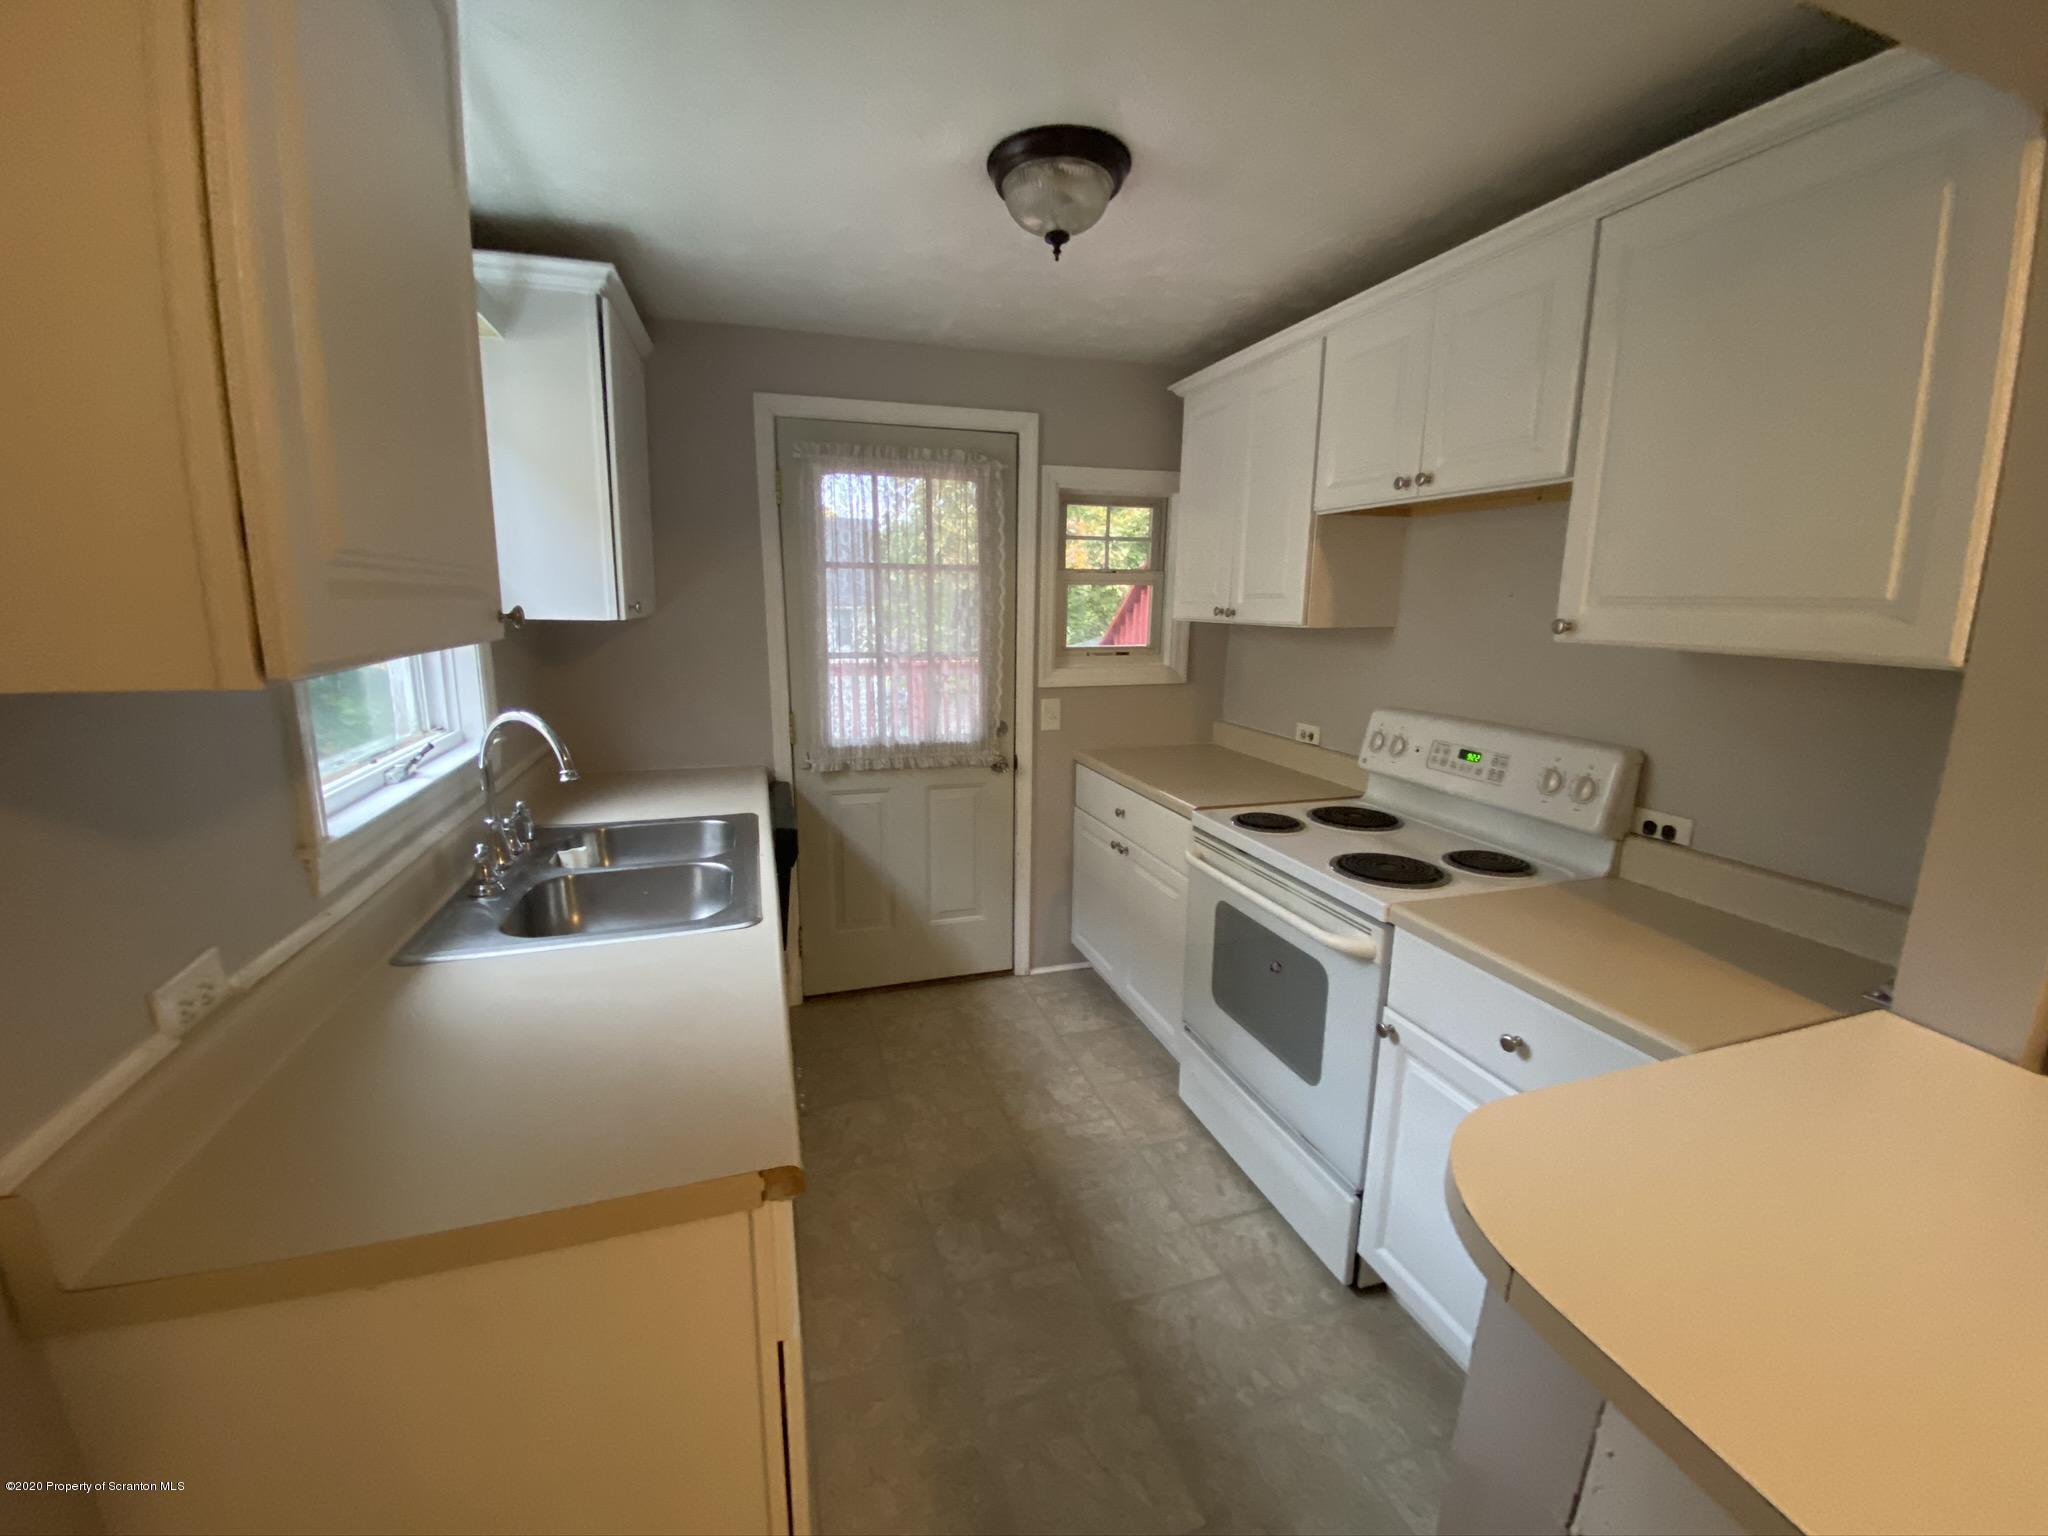 2329 Washington Ave, Scranton, Pennsylvania 18509, 2 Bedrooms Bedrooms, 6 Rooms Rooms,1 BathroomBathrooms,Rental,For Lease,Washington,20-4450